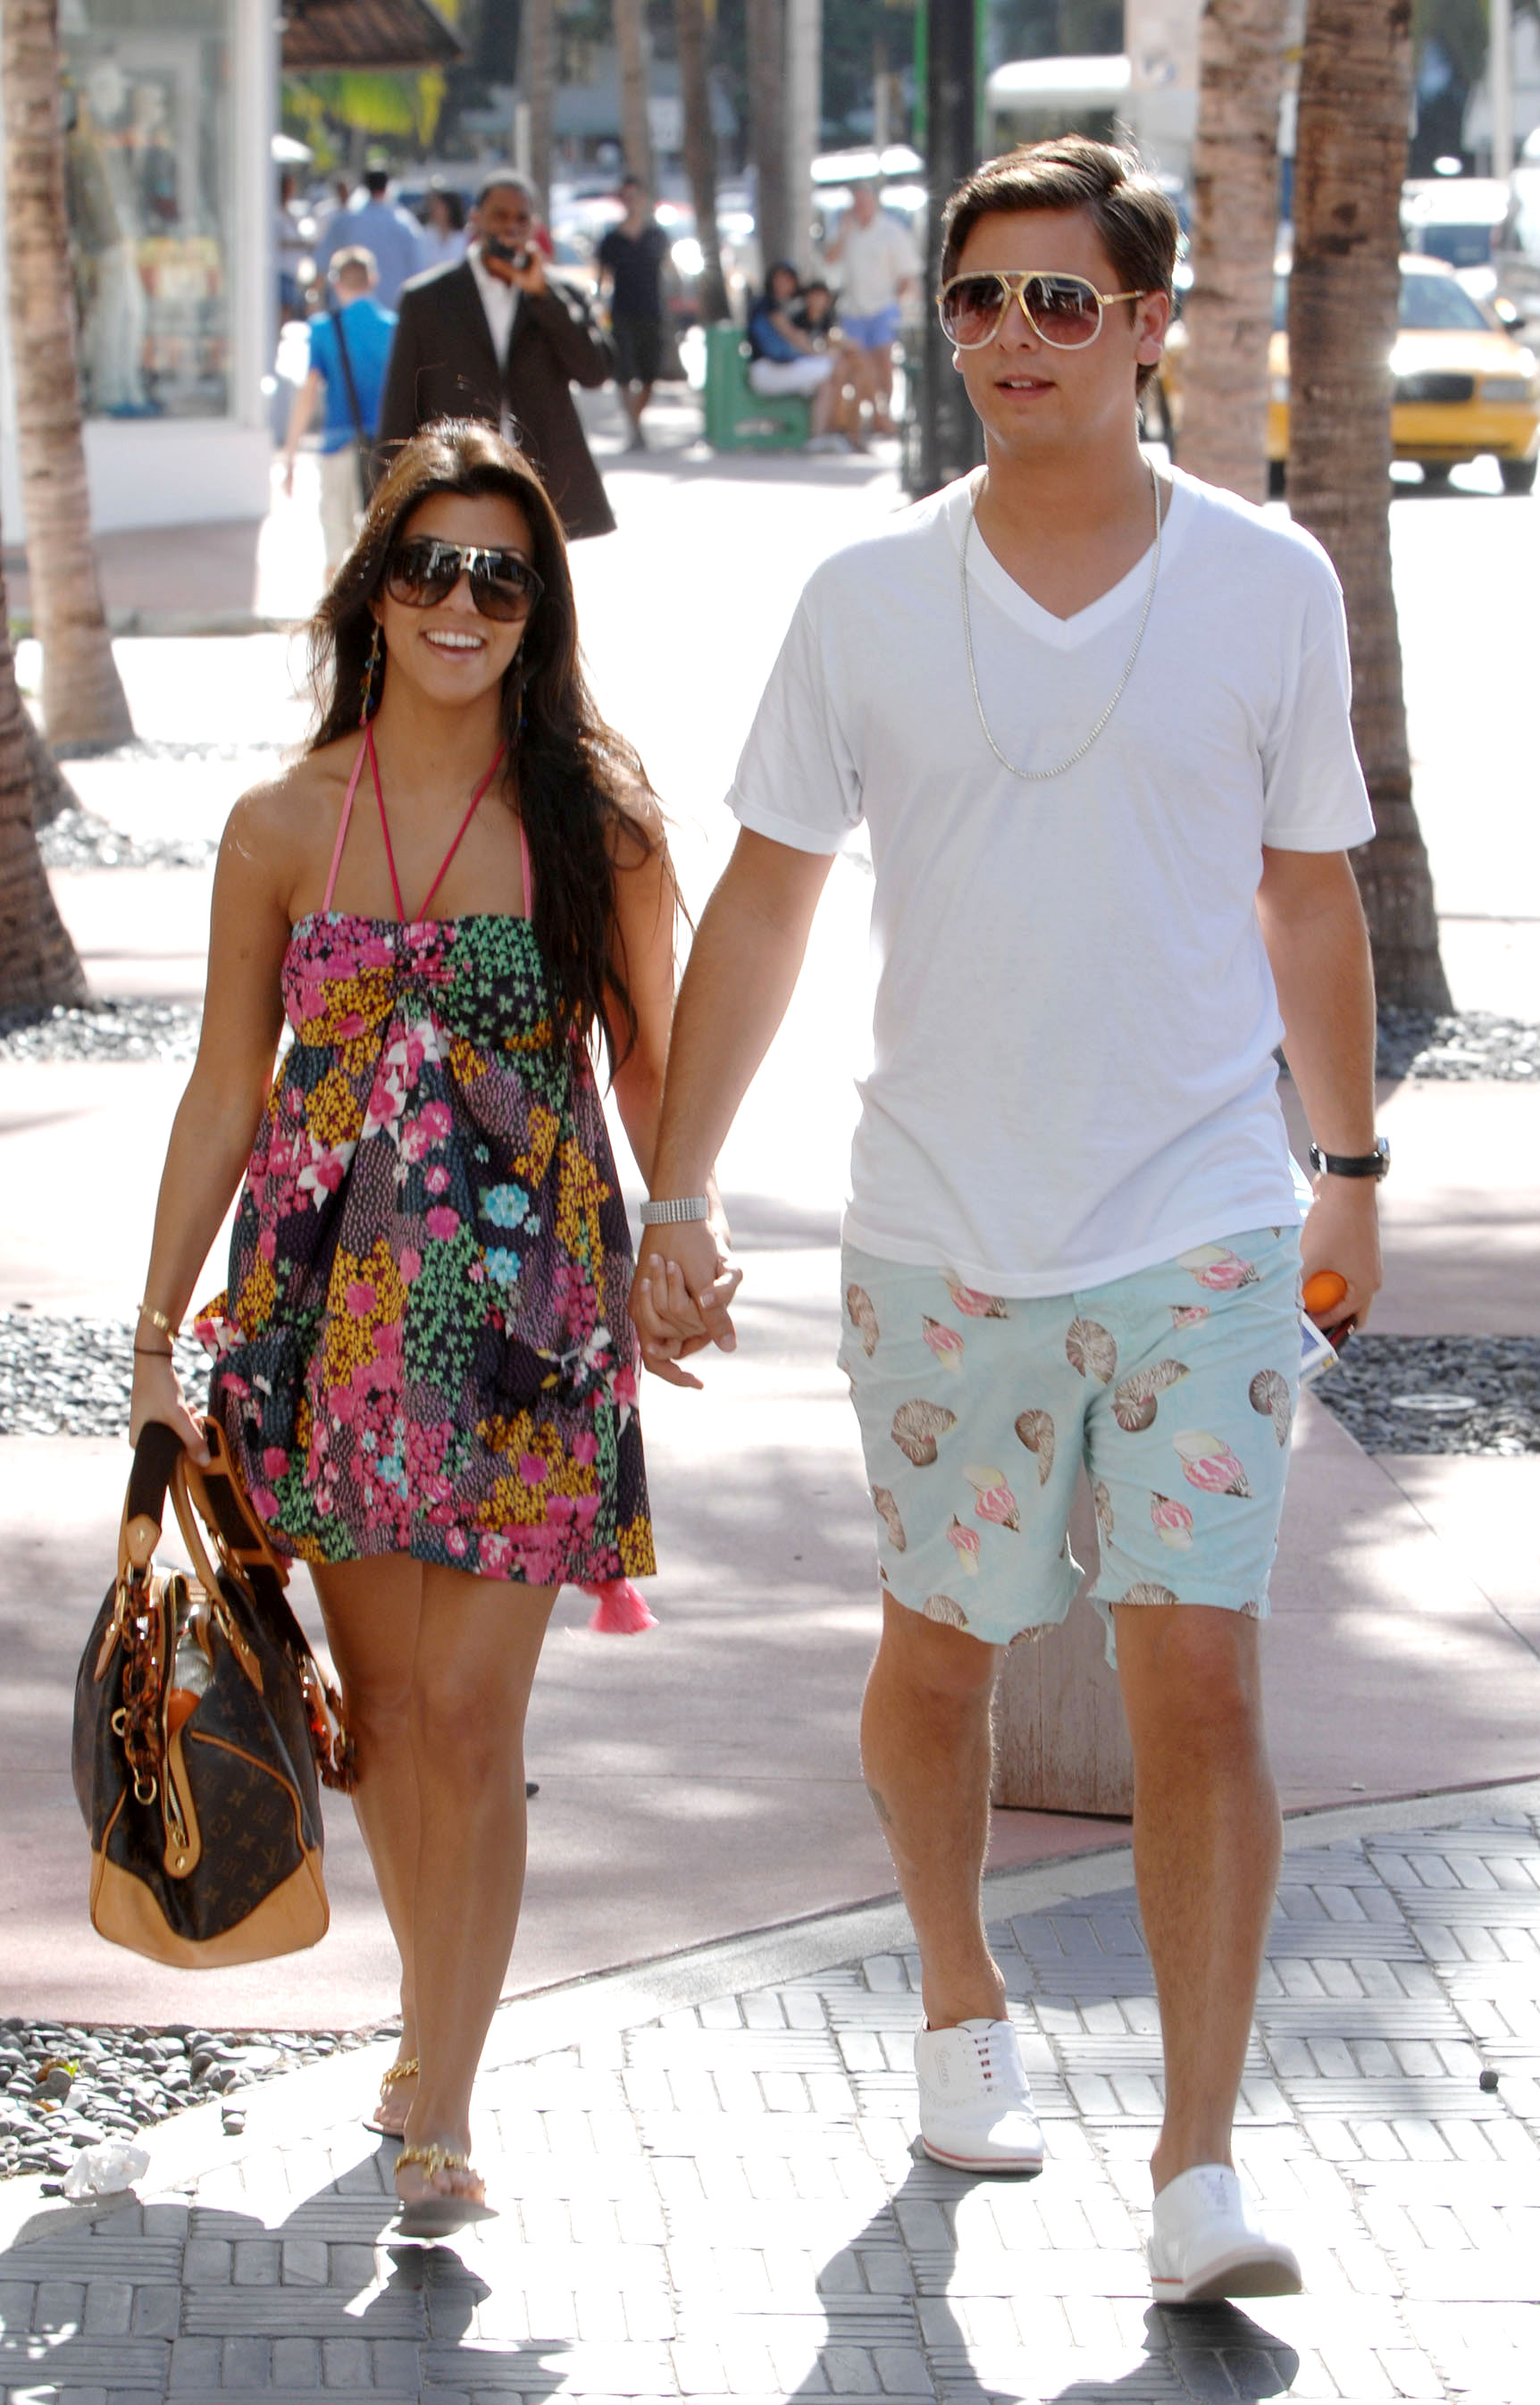 Kourtney Kardashian Through the Years - Kourtney and Disick were inseparable in 2007.